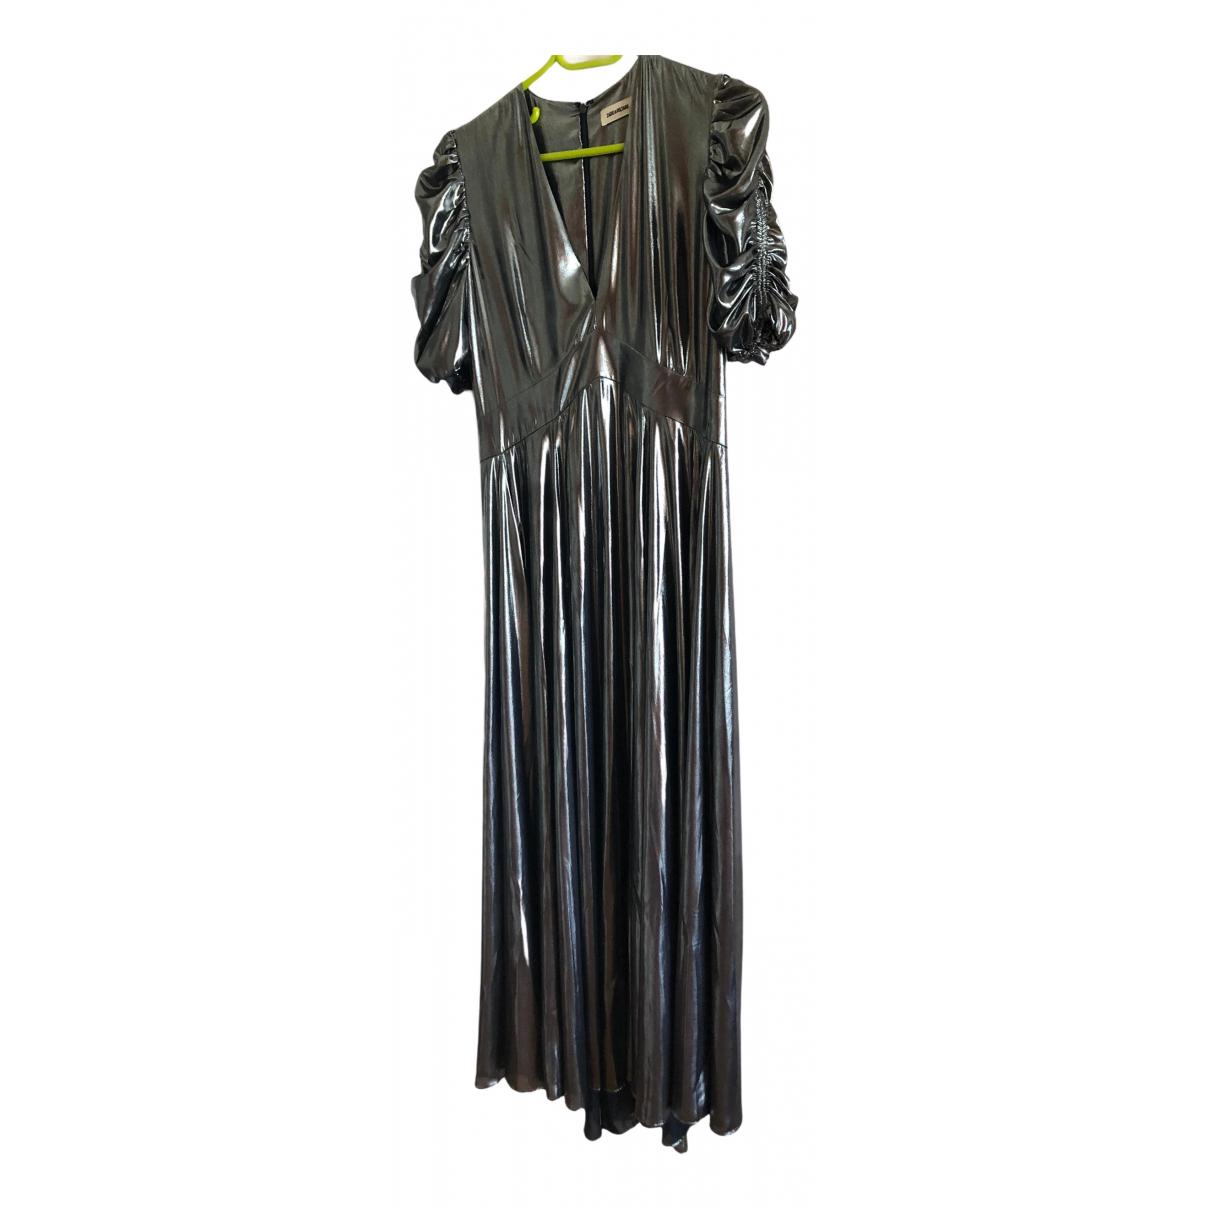 Zadig & Voltaire Spring Summer 2020 Kleid in  Silber Polyester